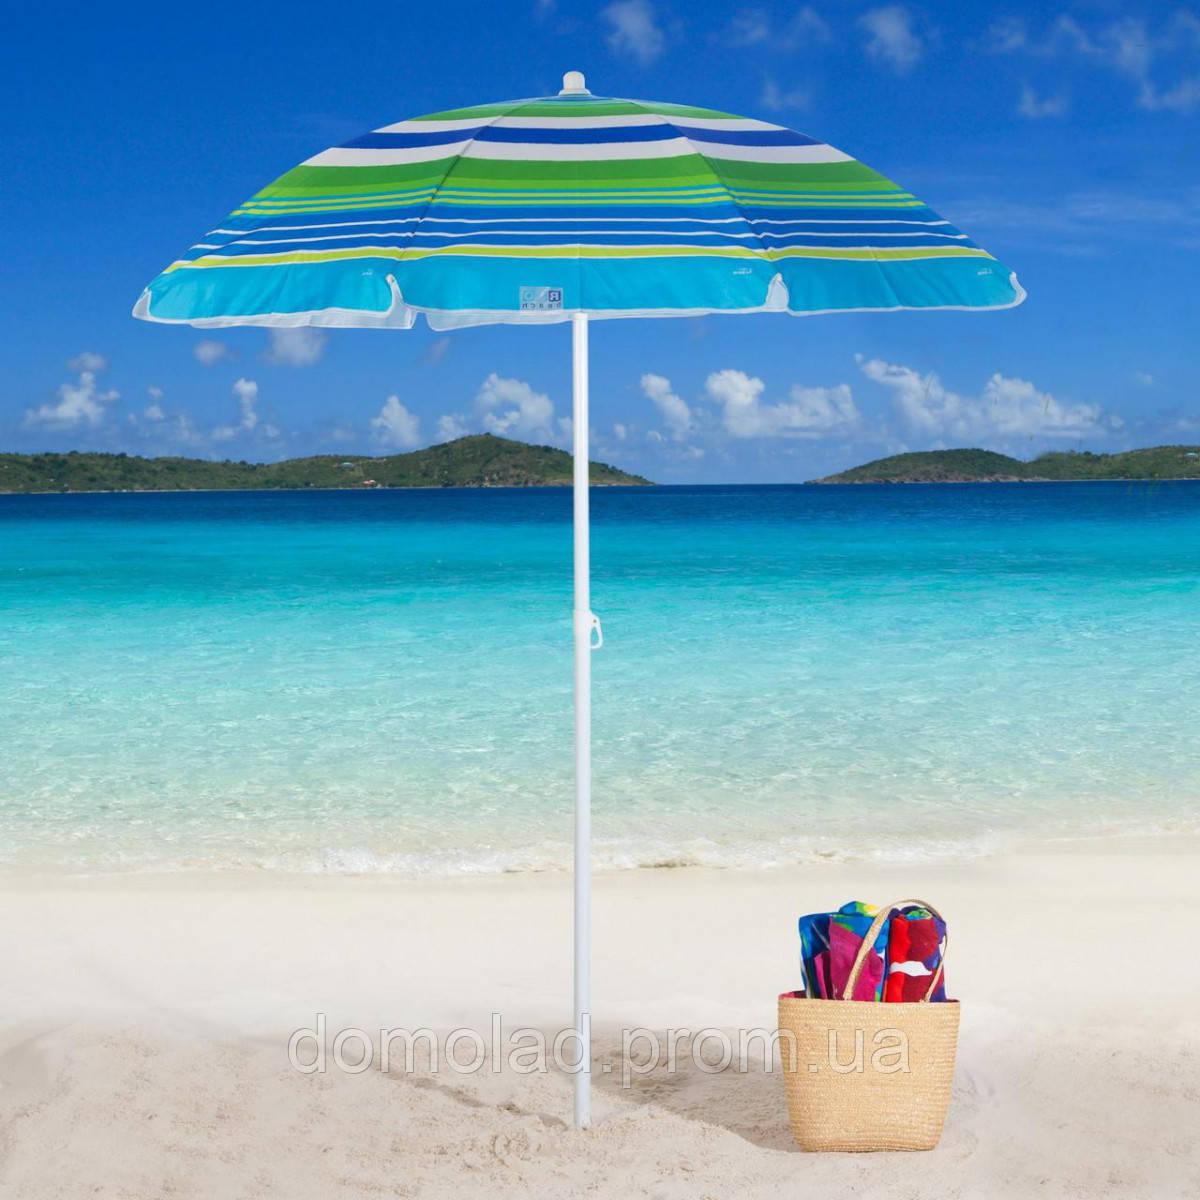 Пляжний Складаний Похилий Сонцезахисний Парасольку 220 см Парасольку